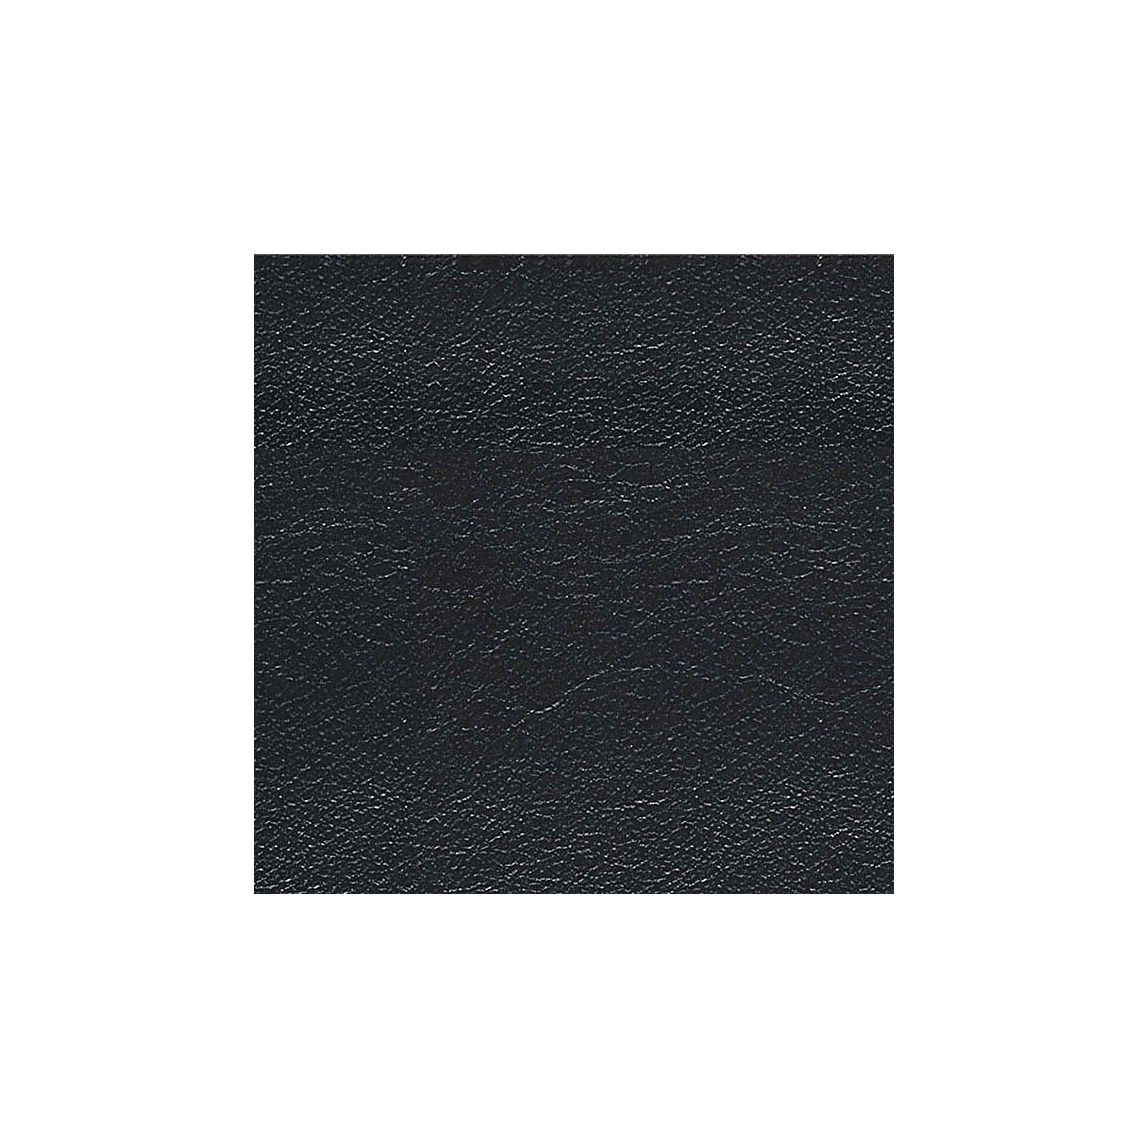 Leather Black Swatch